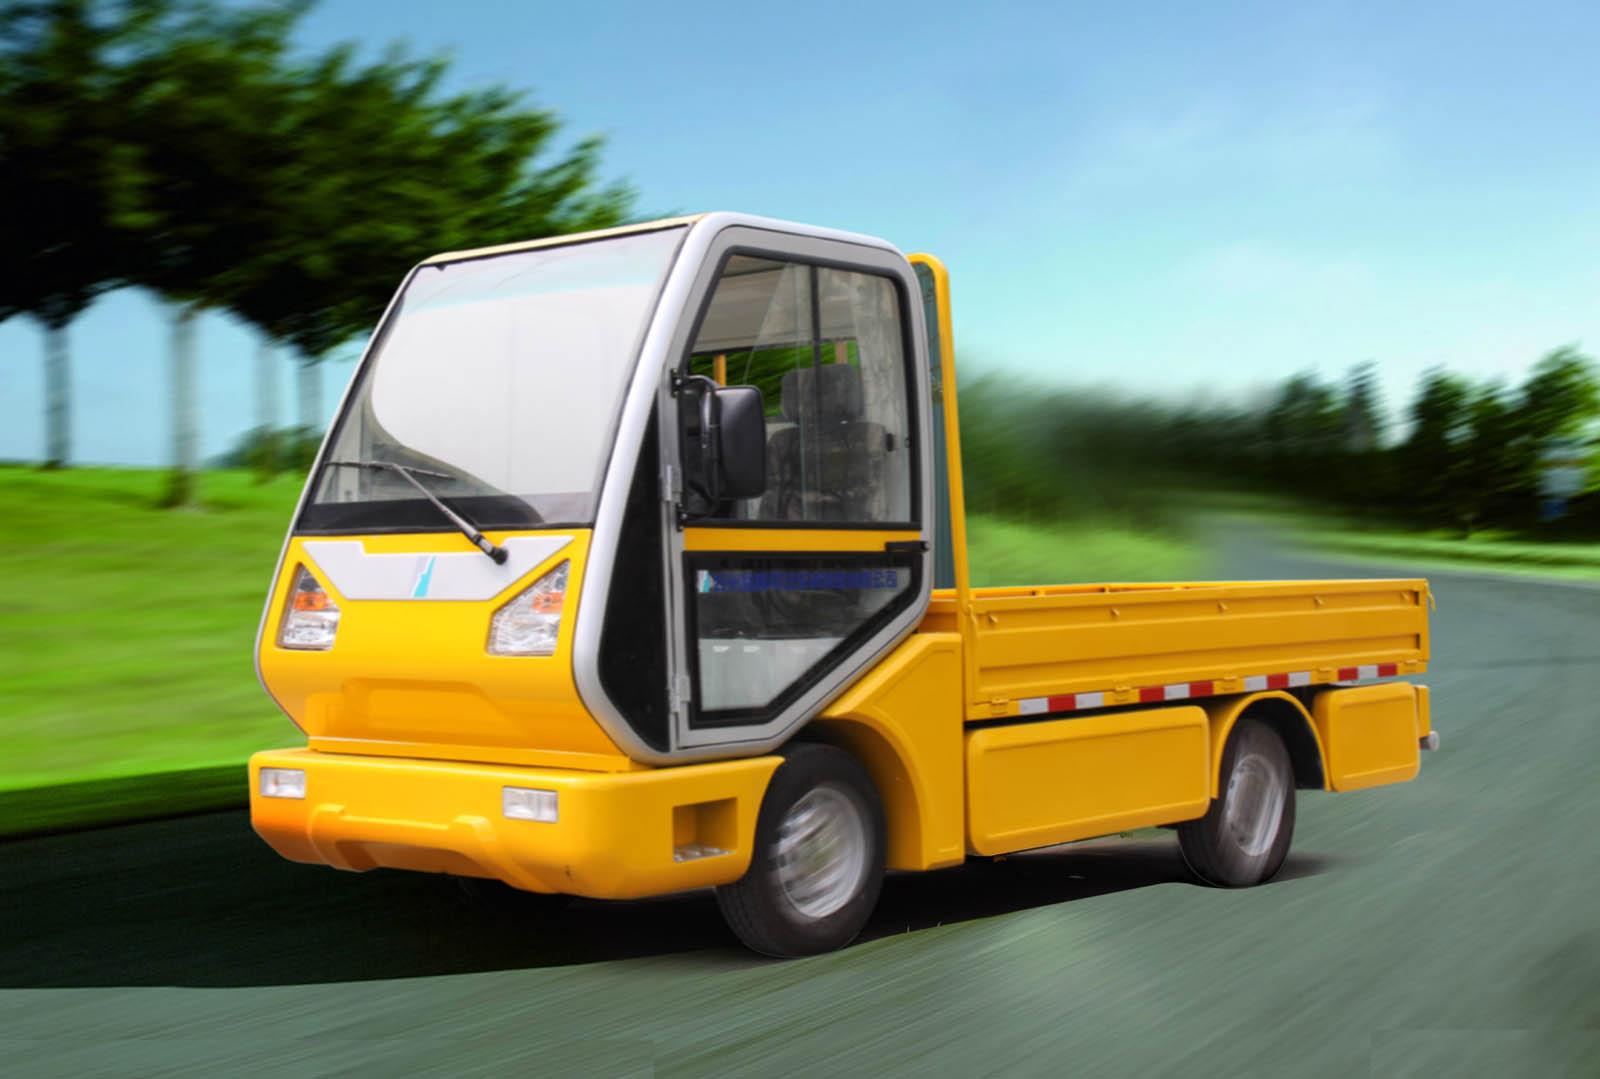 Electric mini-truck